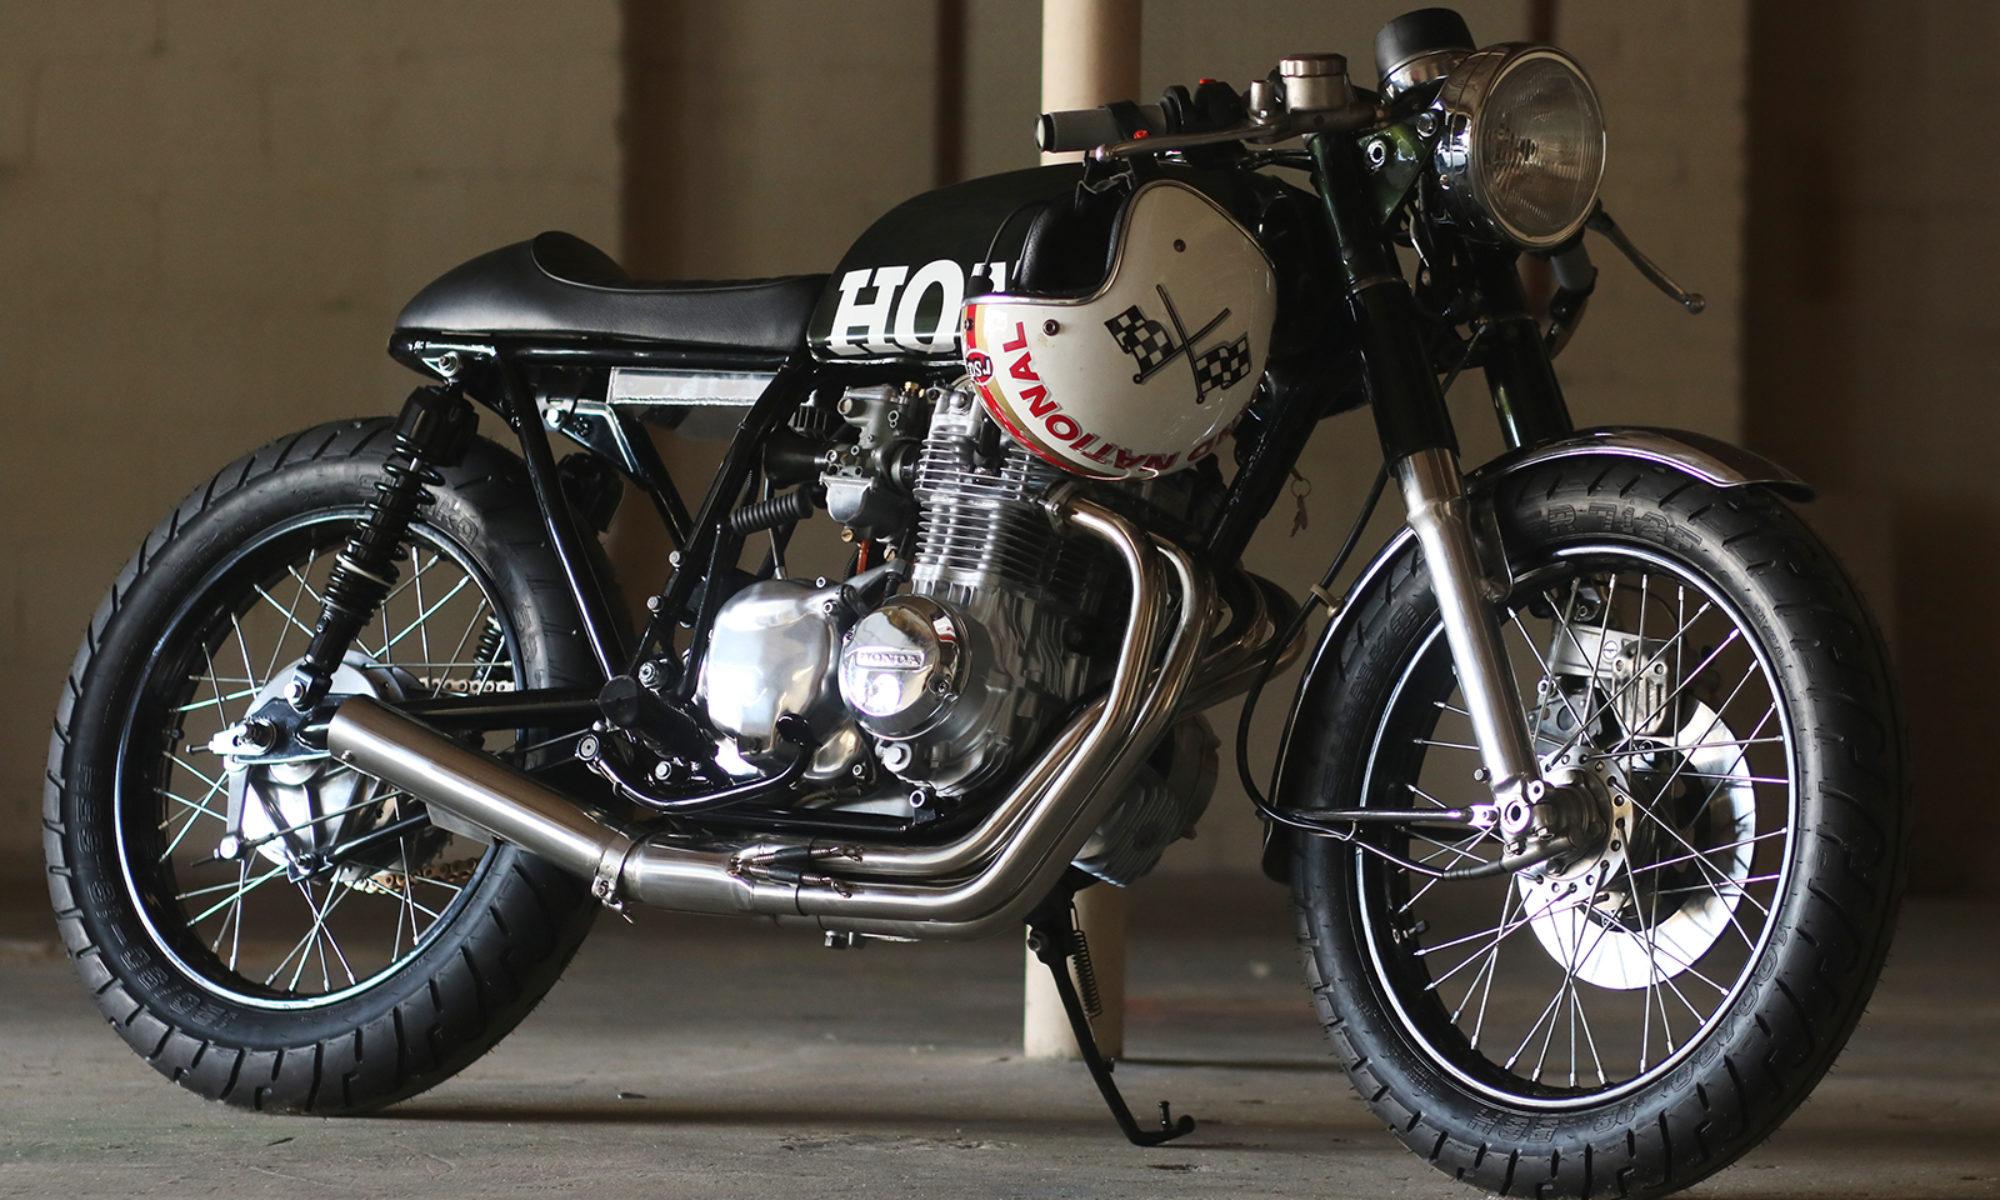 Gaston.Motorcycle.Werks 704.671.4585